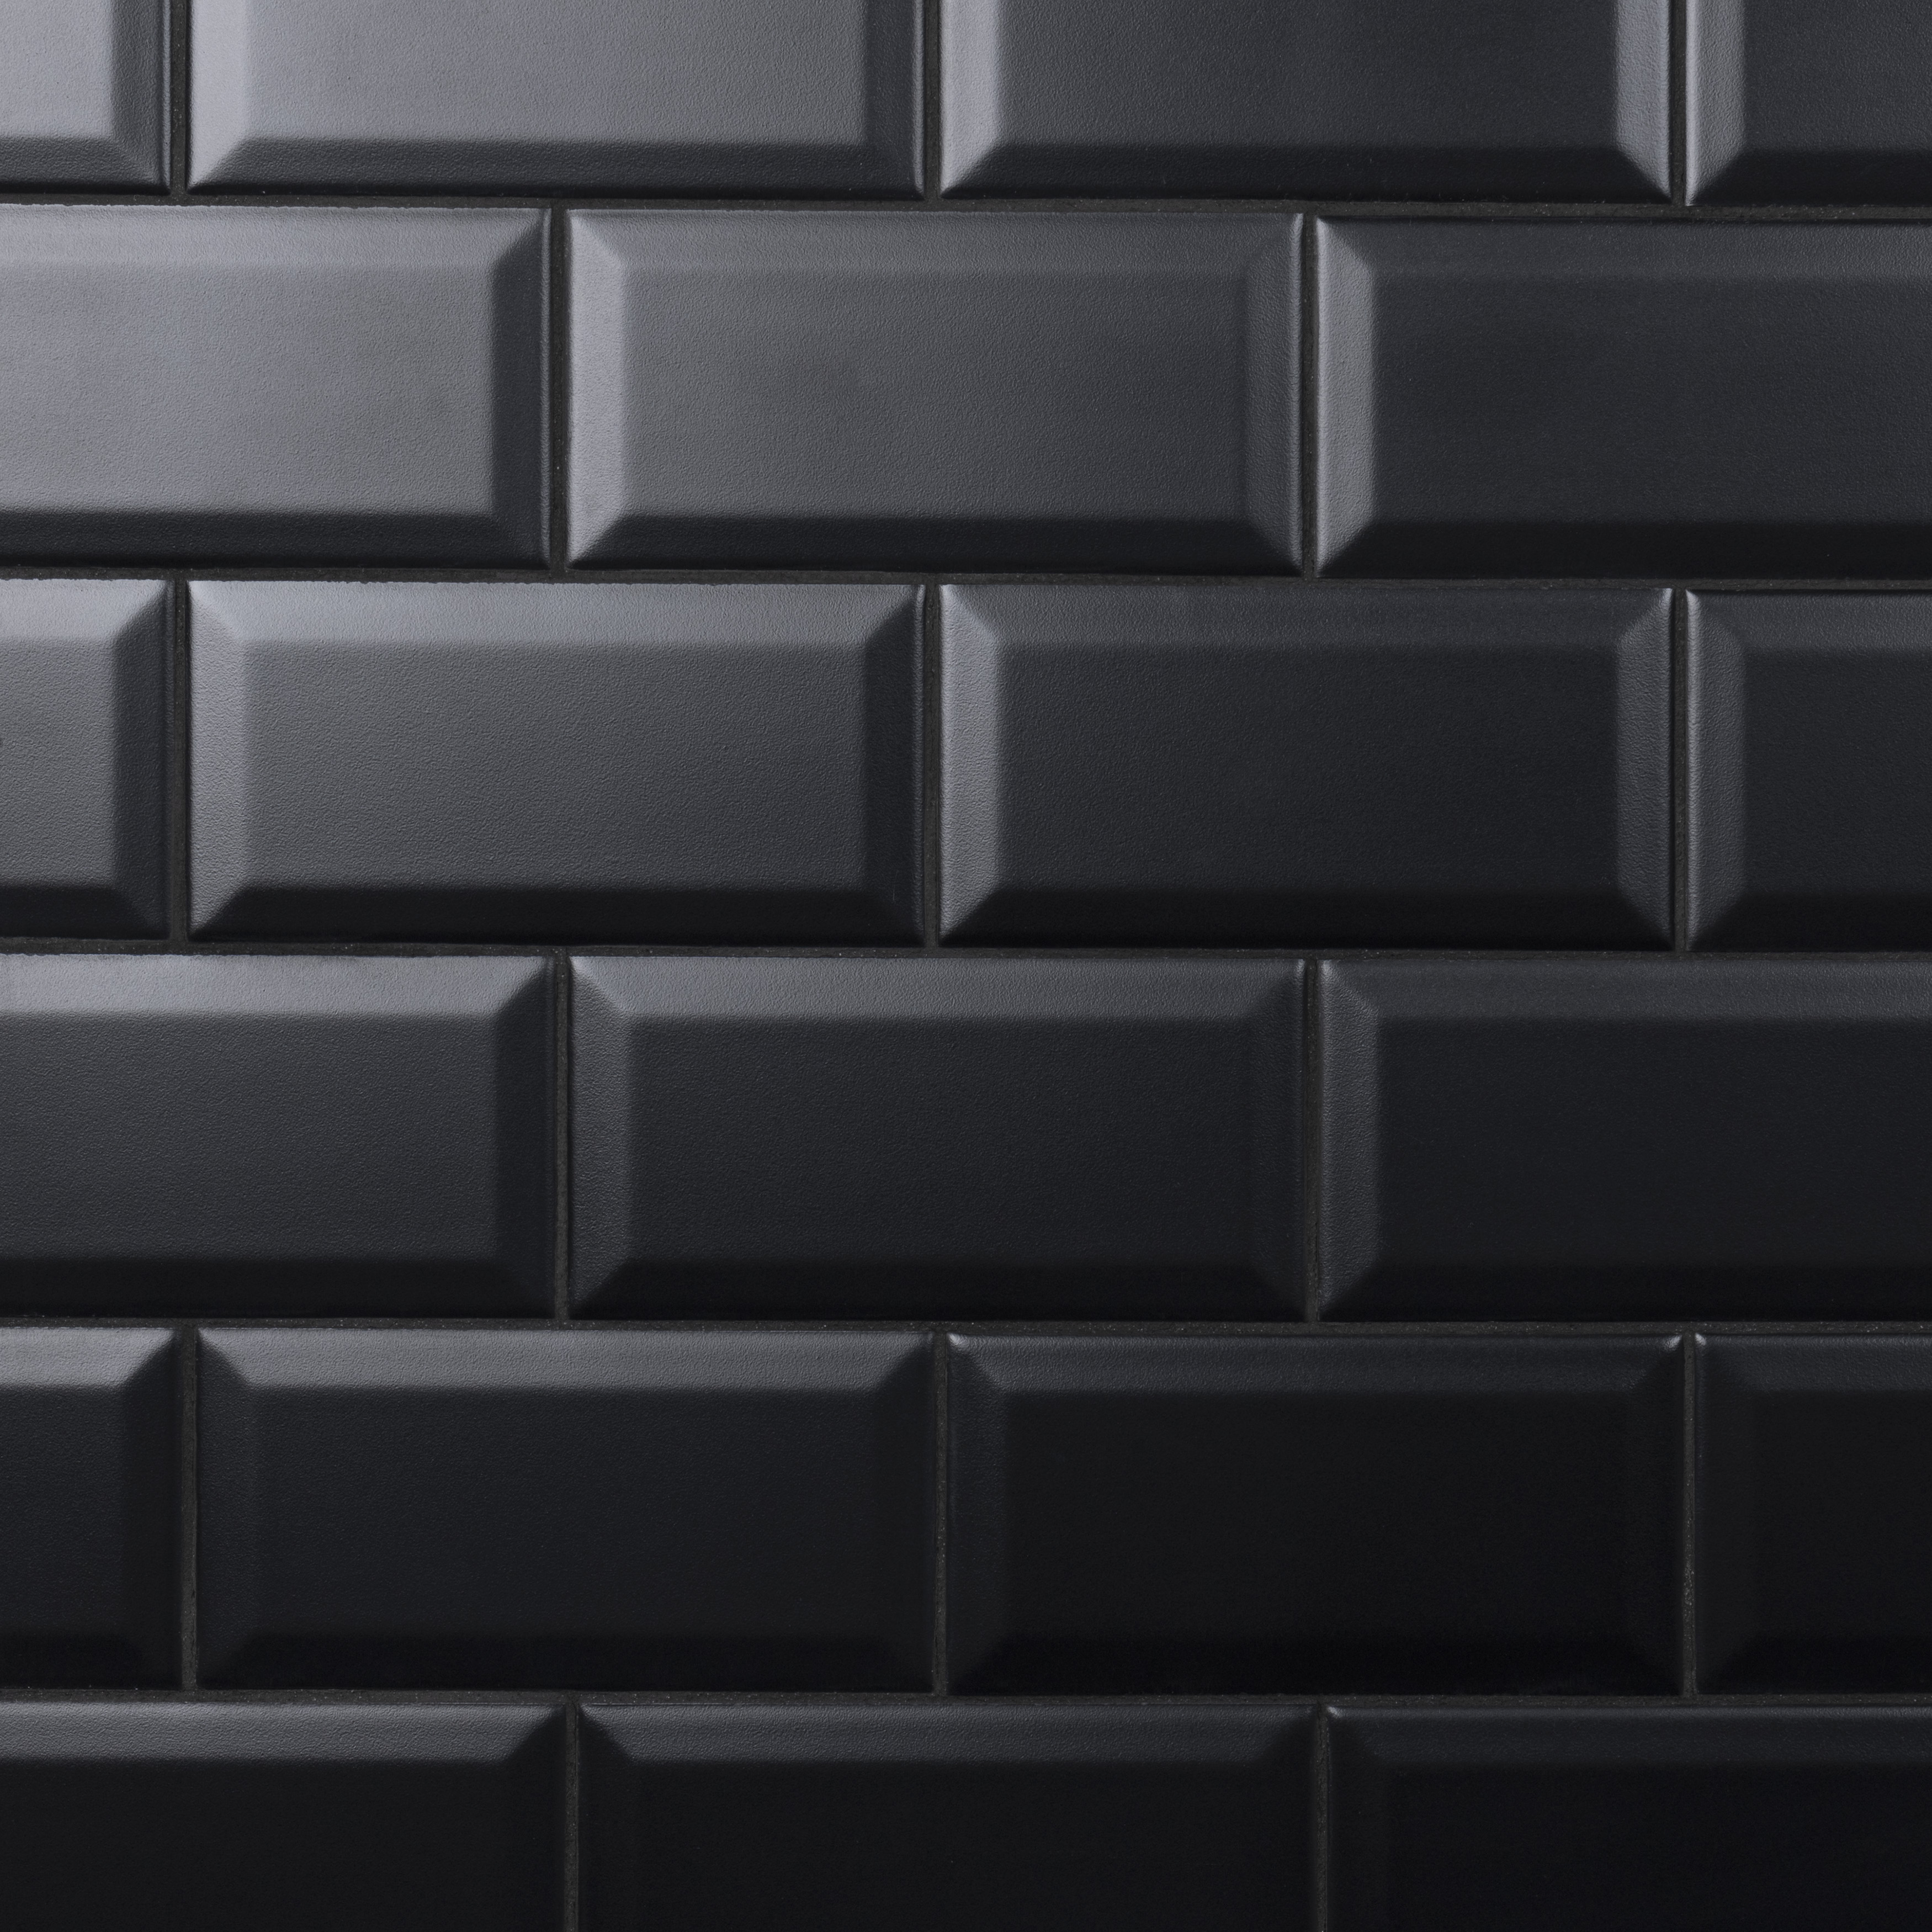 somertile crown heights beveled matte 3 x6 black ceramic wall tile 6 03 sq ft case walmart com